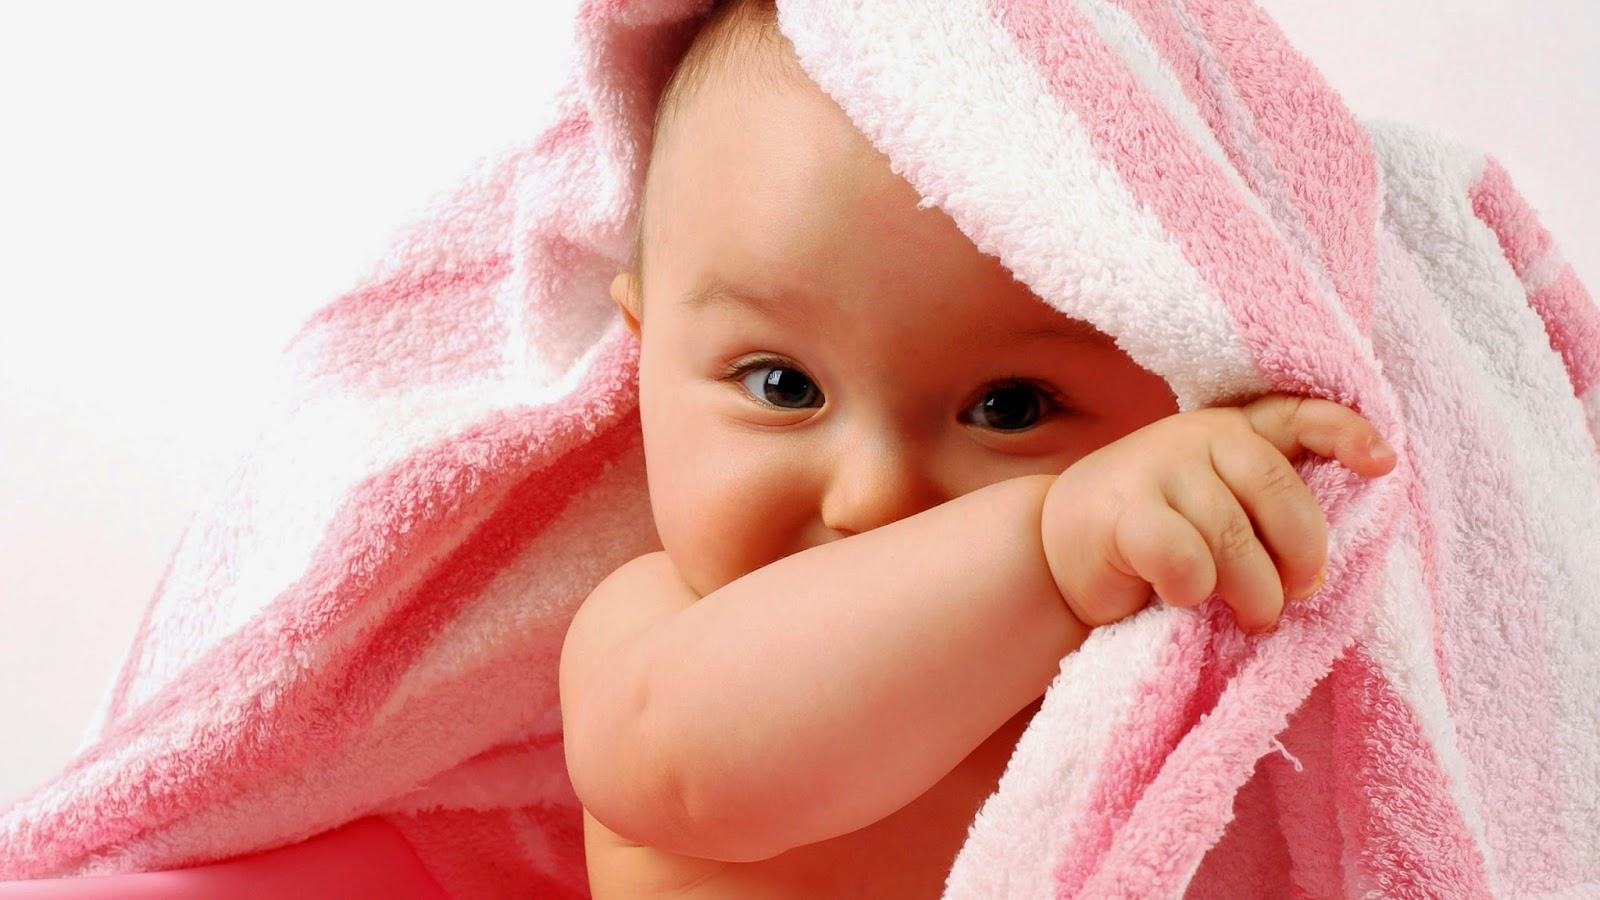 bayi lucu imut